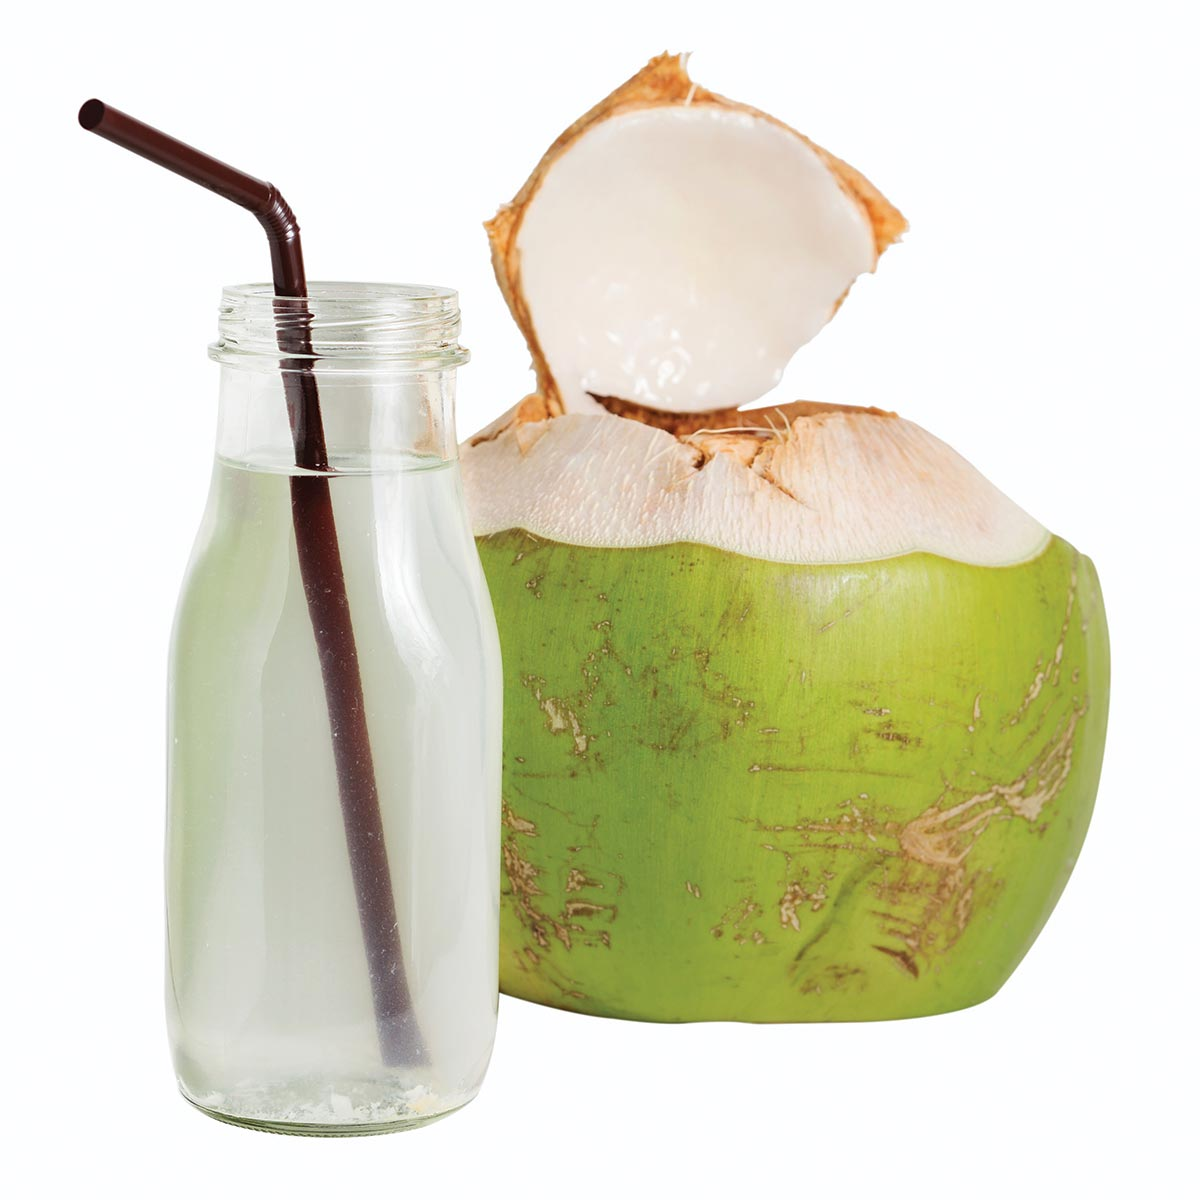 Kokosova voda - zdrav napitek in izotonik